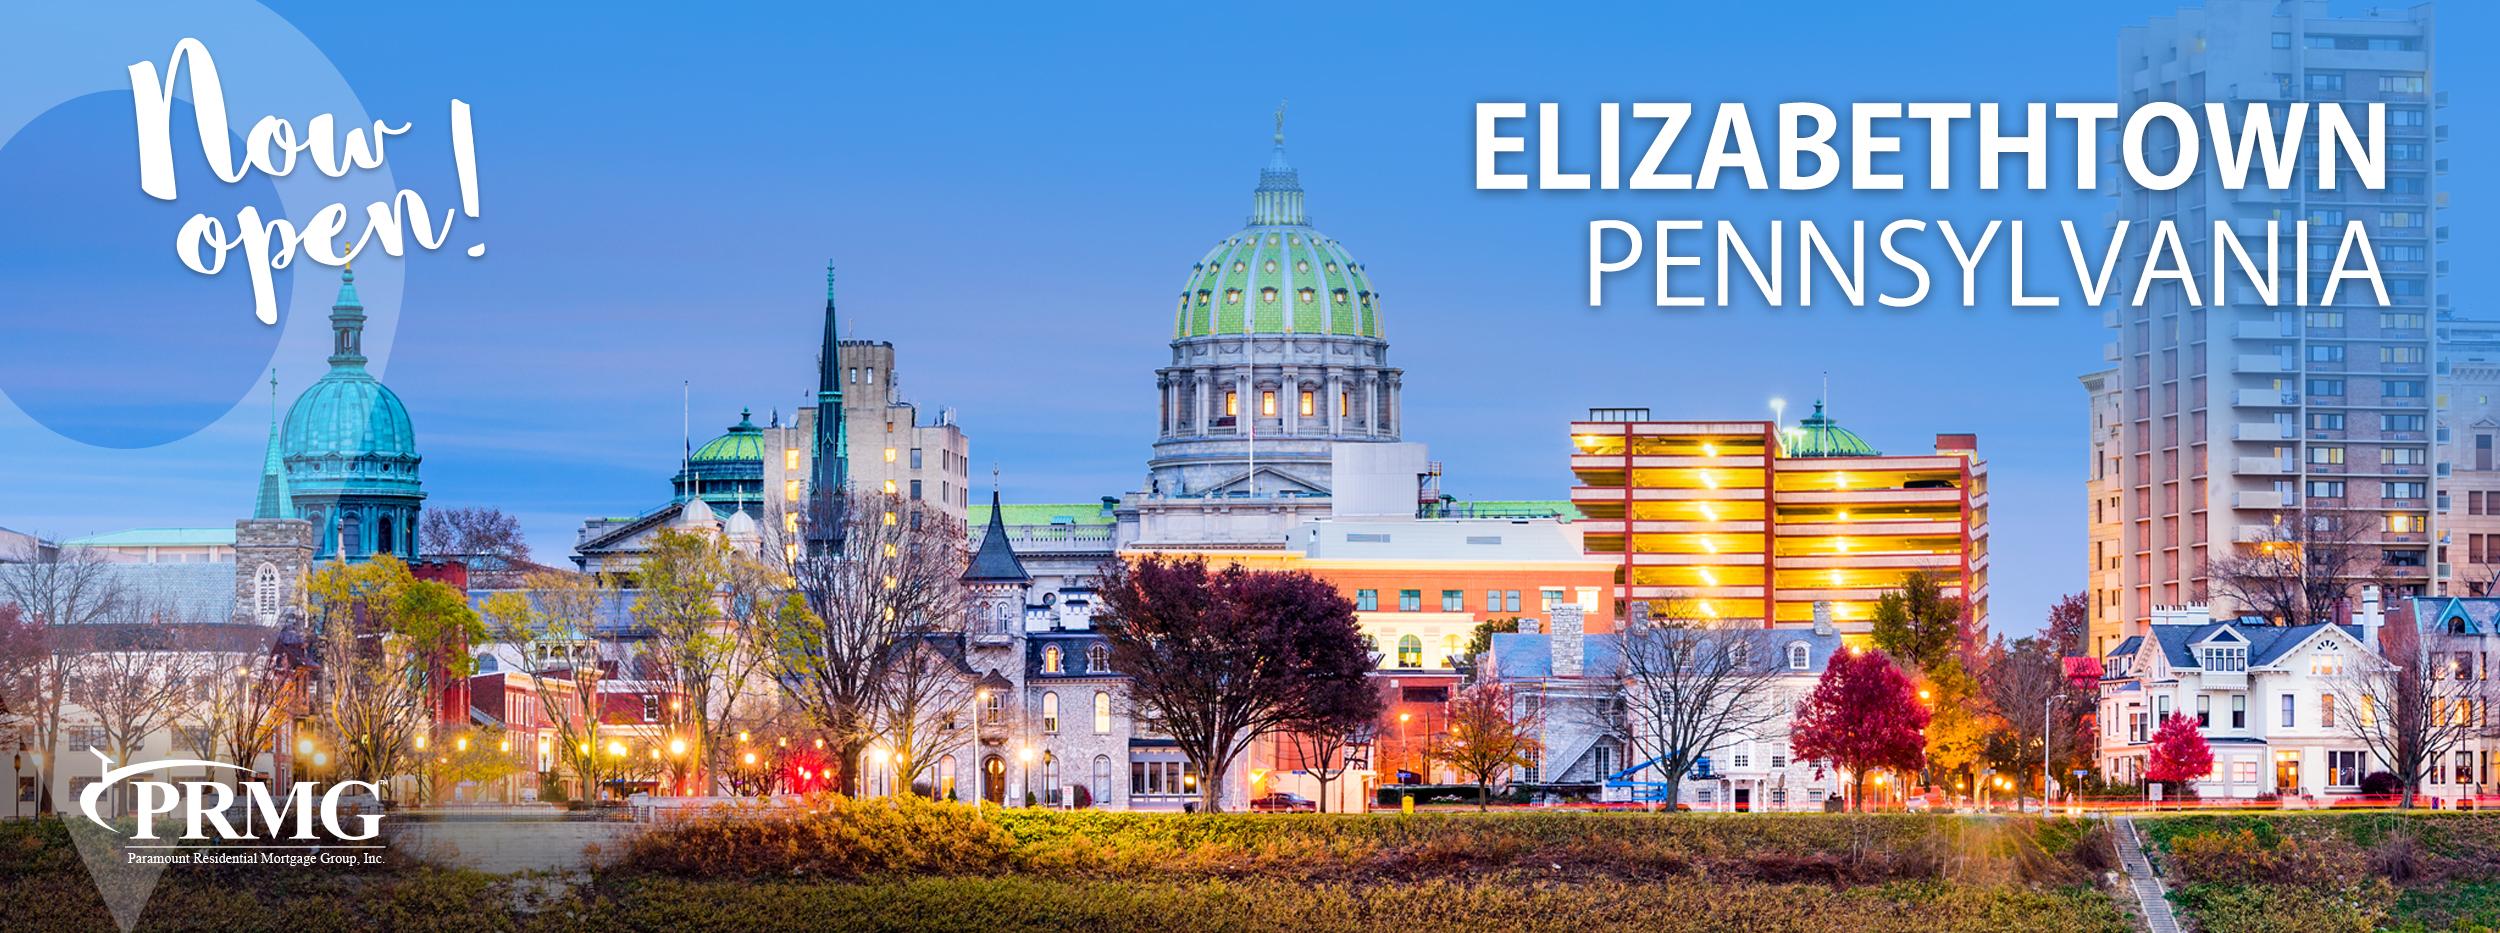 Elizabethtown, PA - Header.jpg